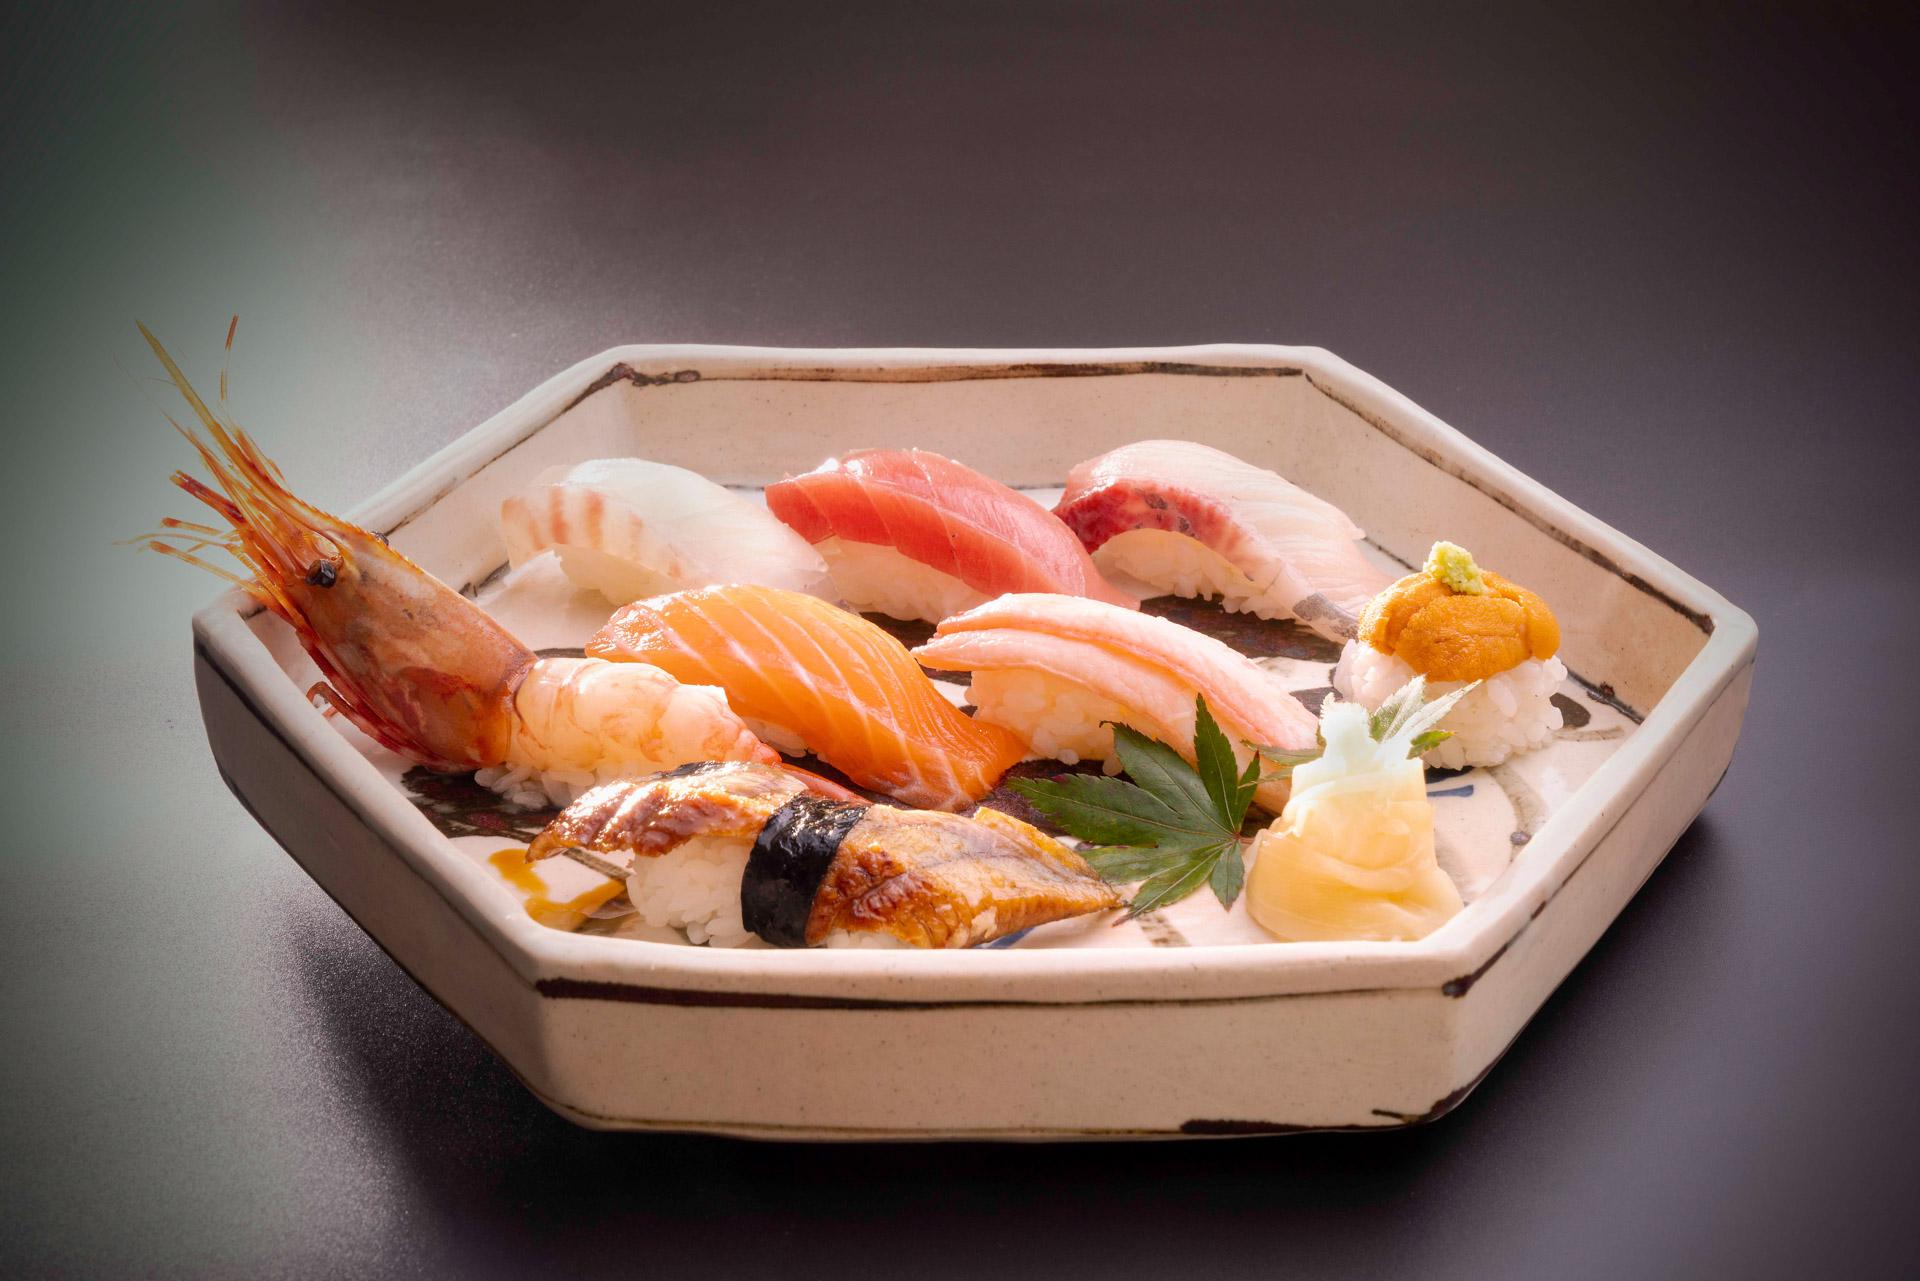 K11母親節限定網上購物平台 頑固壽司 廚師發板晚市套餐 (堂食)每位港幣 720 元